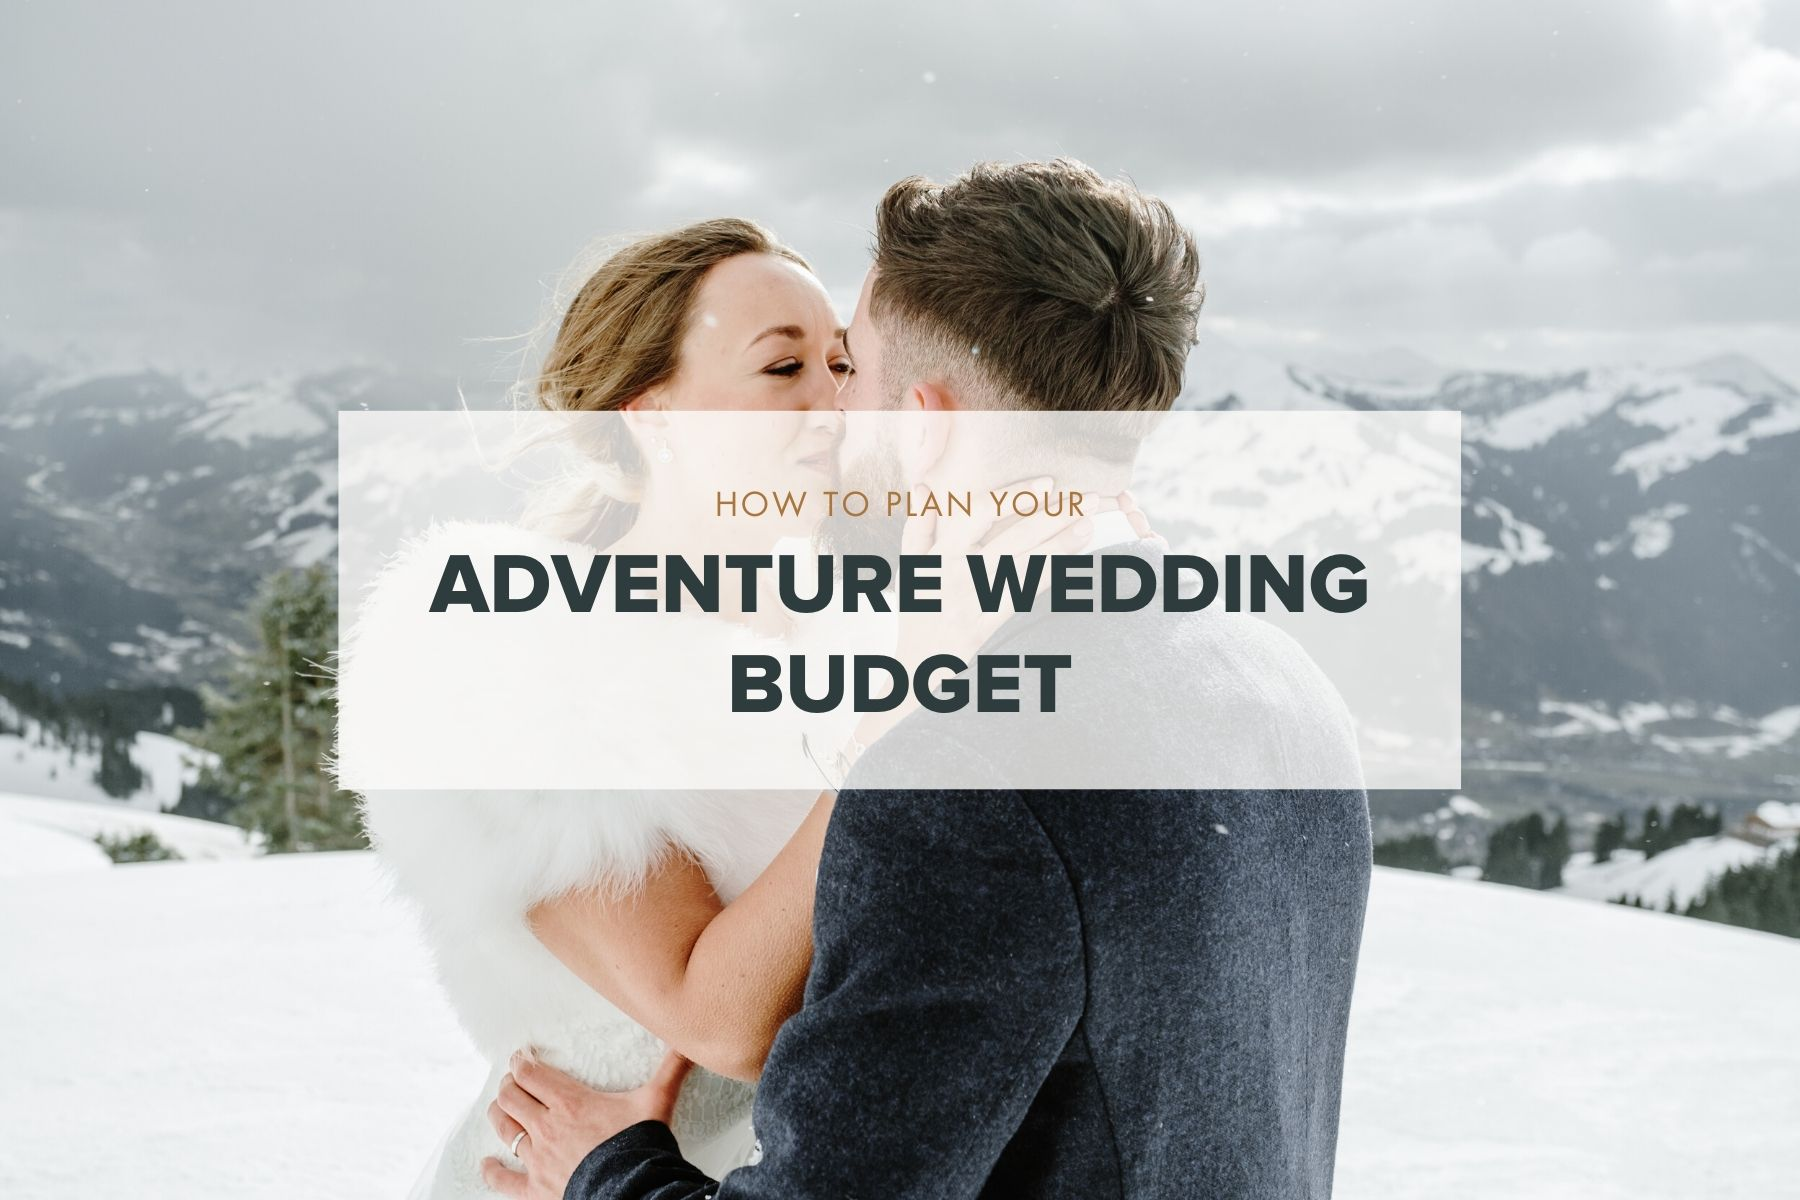 How to plan an adventure wedding budget